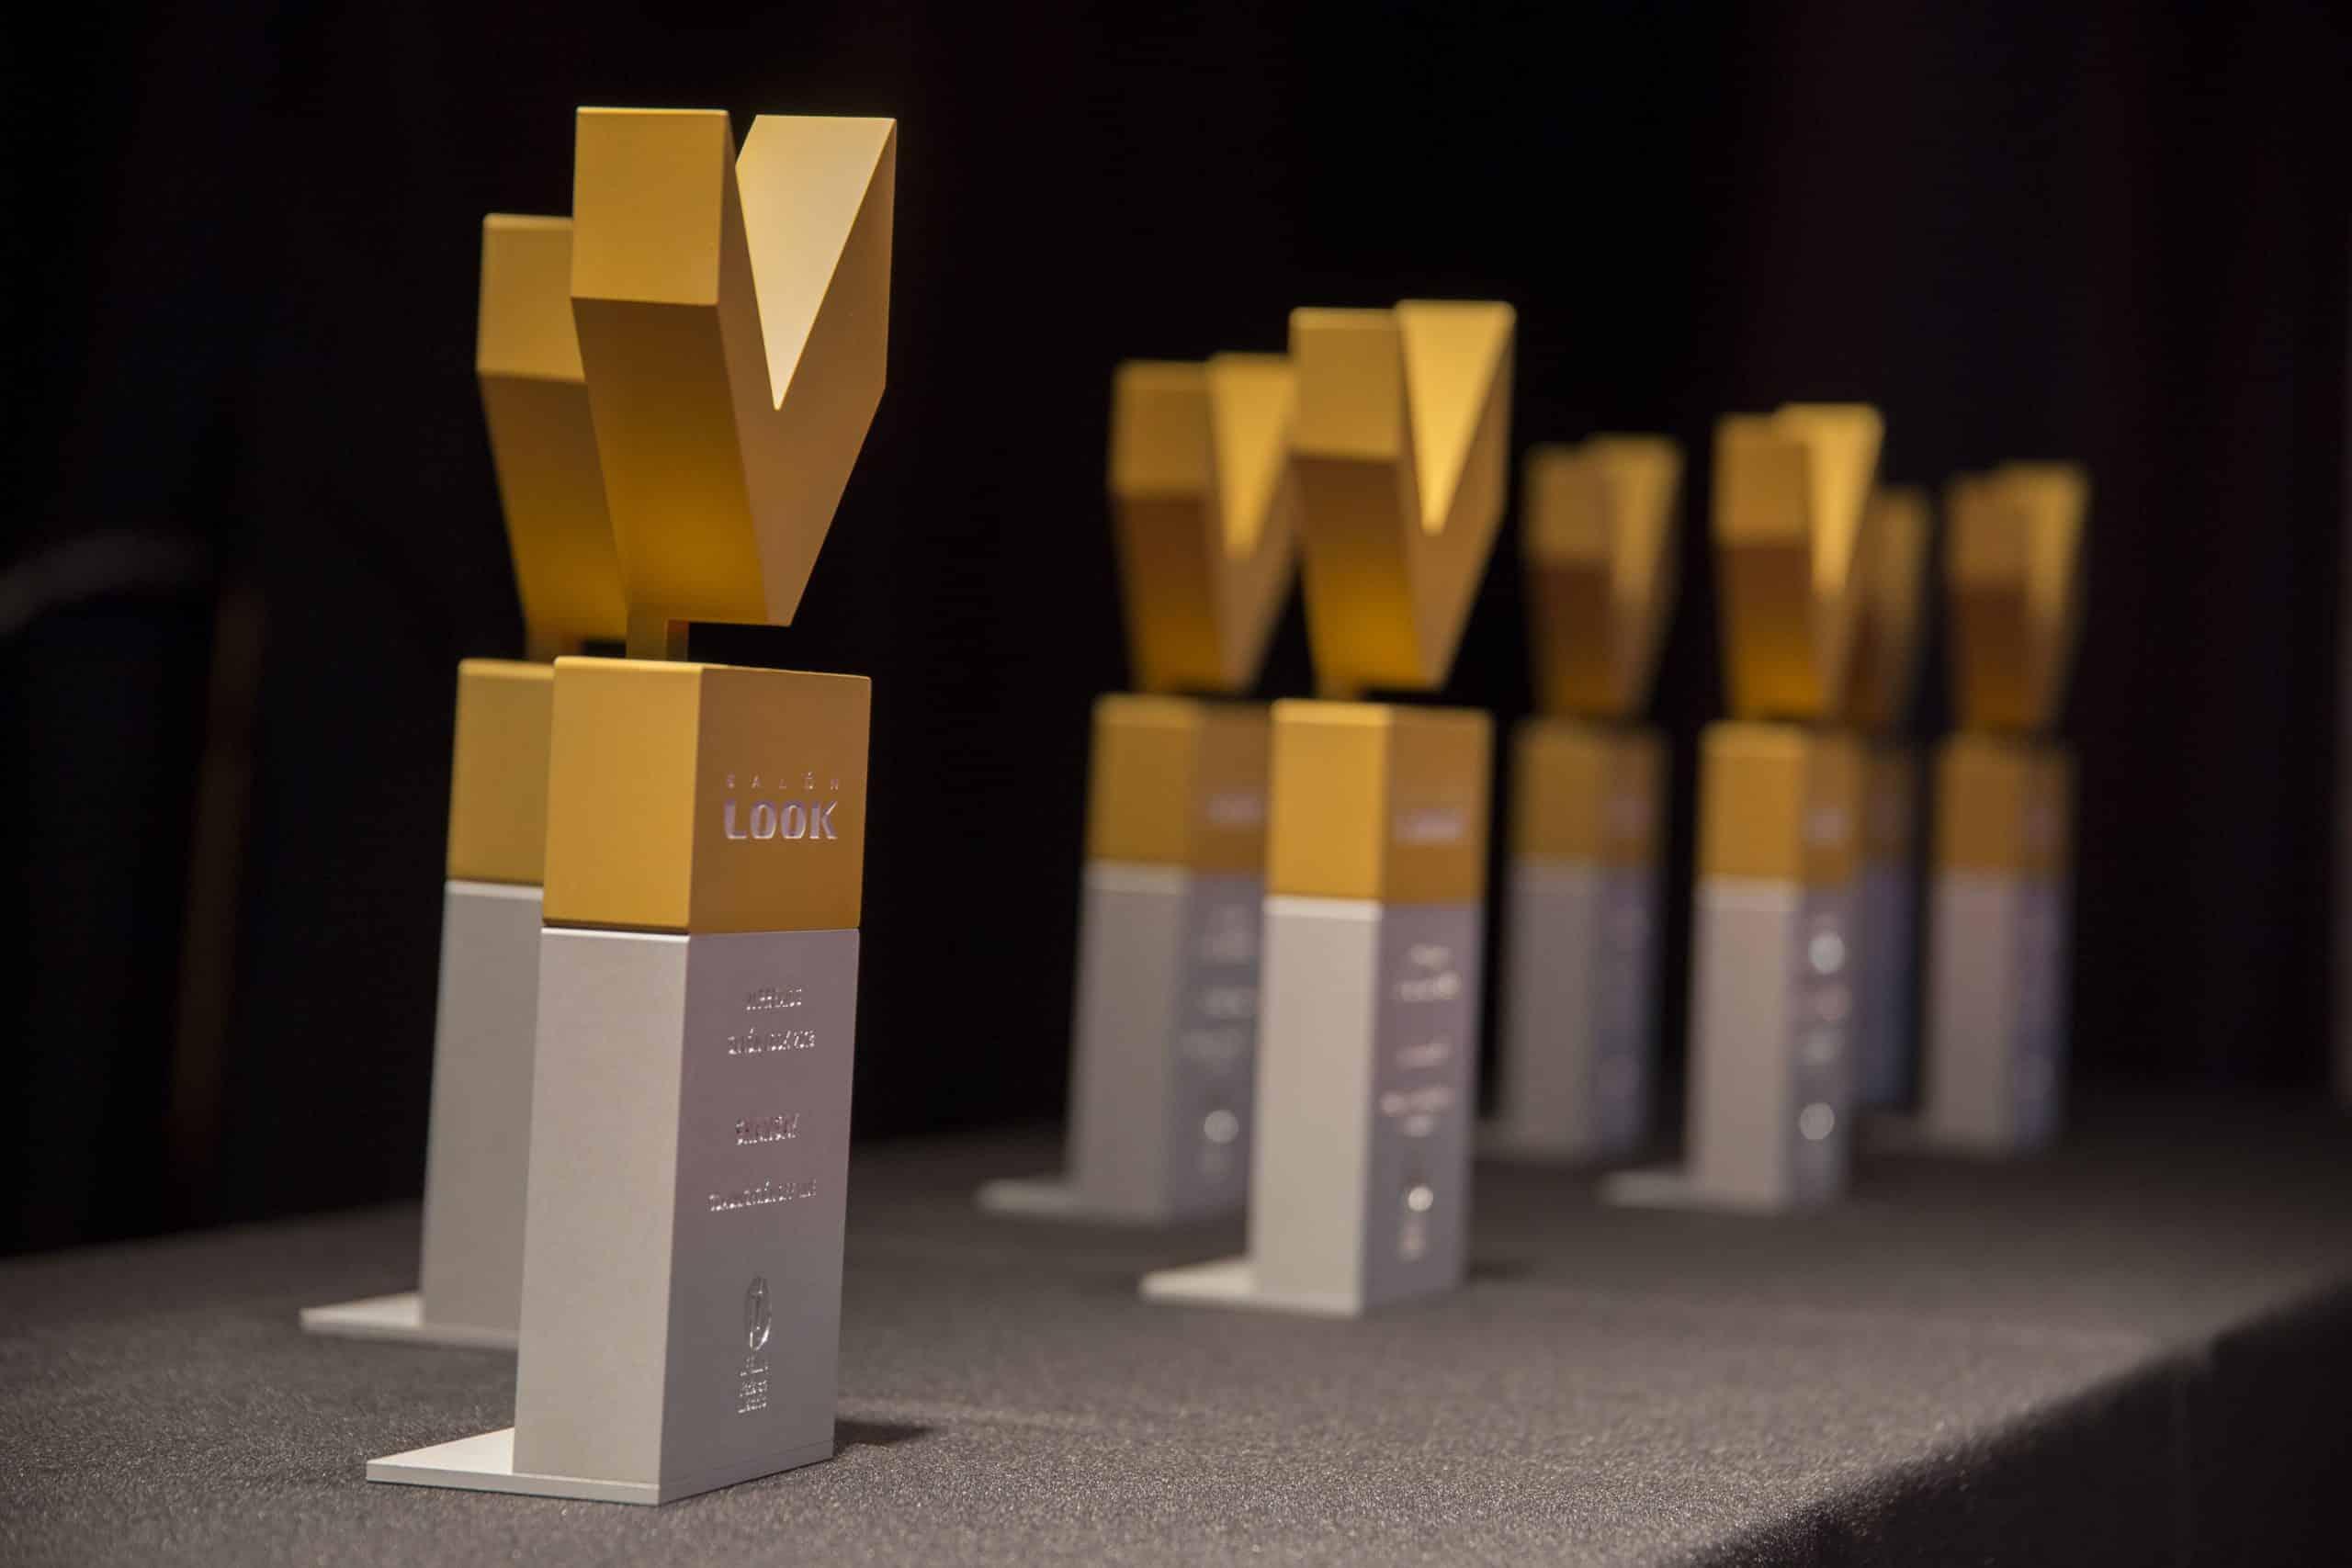 LK18 Premios 002 scaled